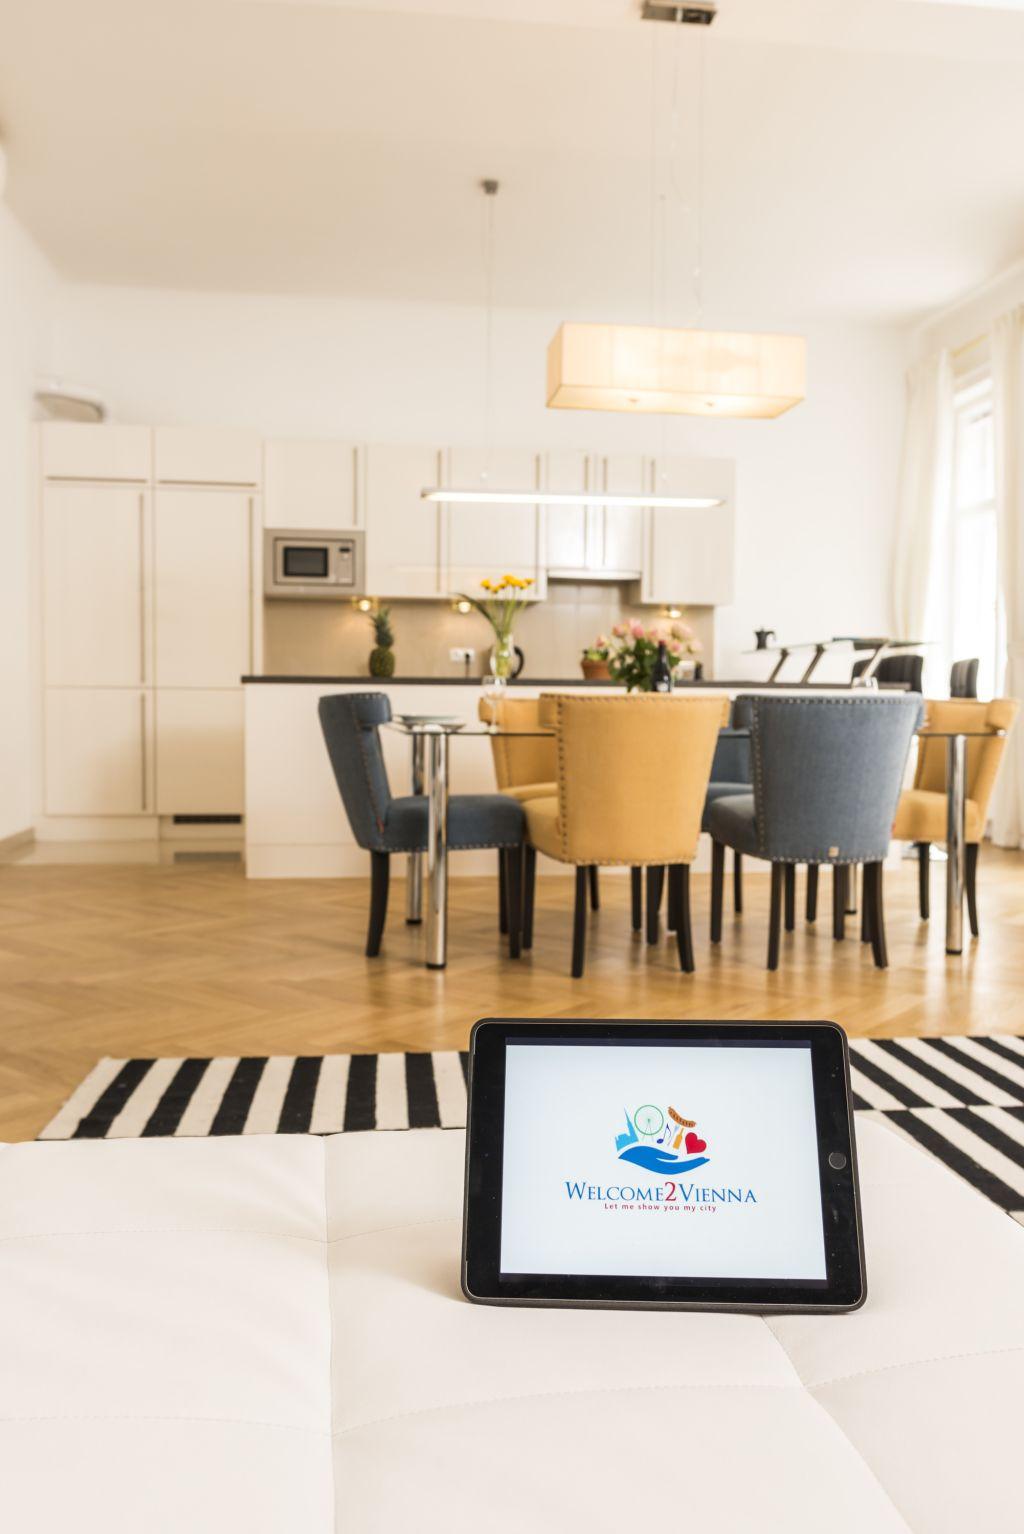 image 7 furnished 3 bedroom Apartment for rent in Wieden, Vienna